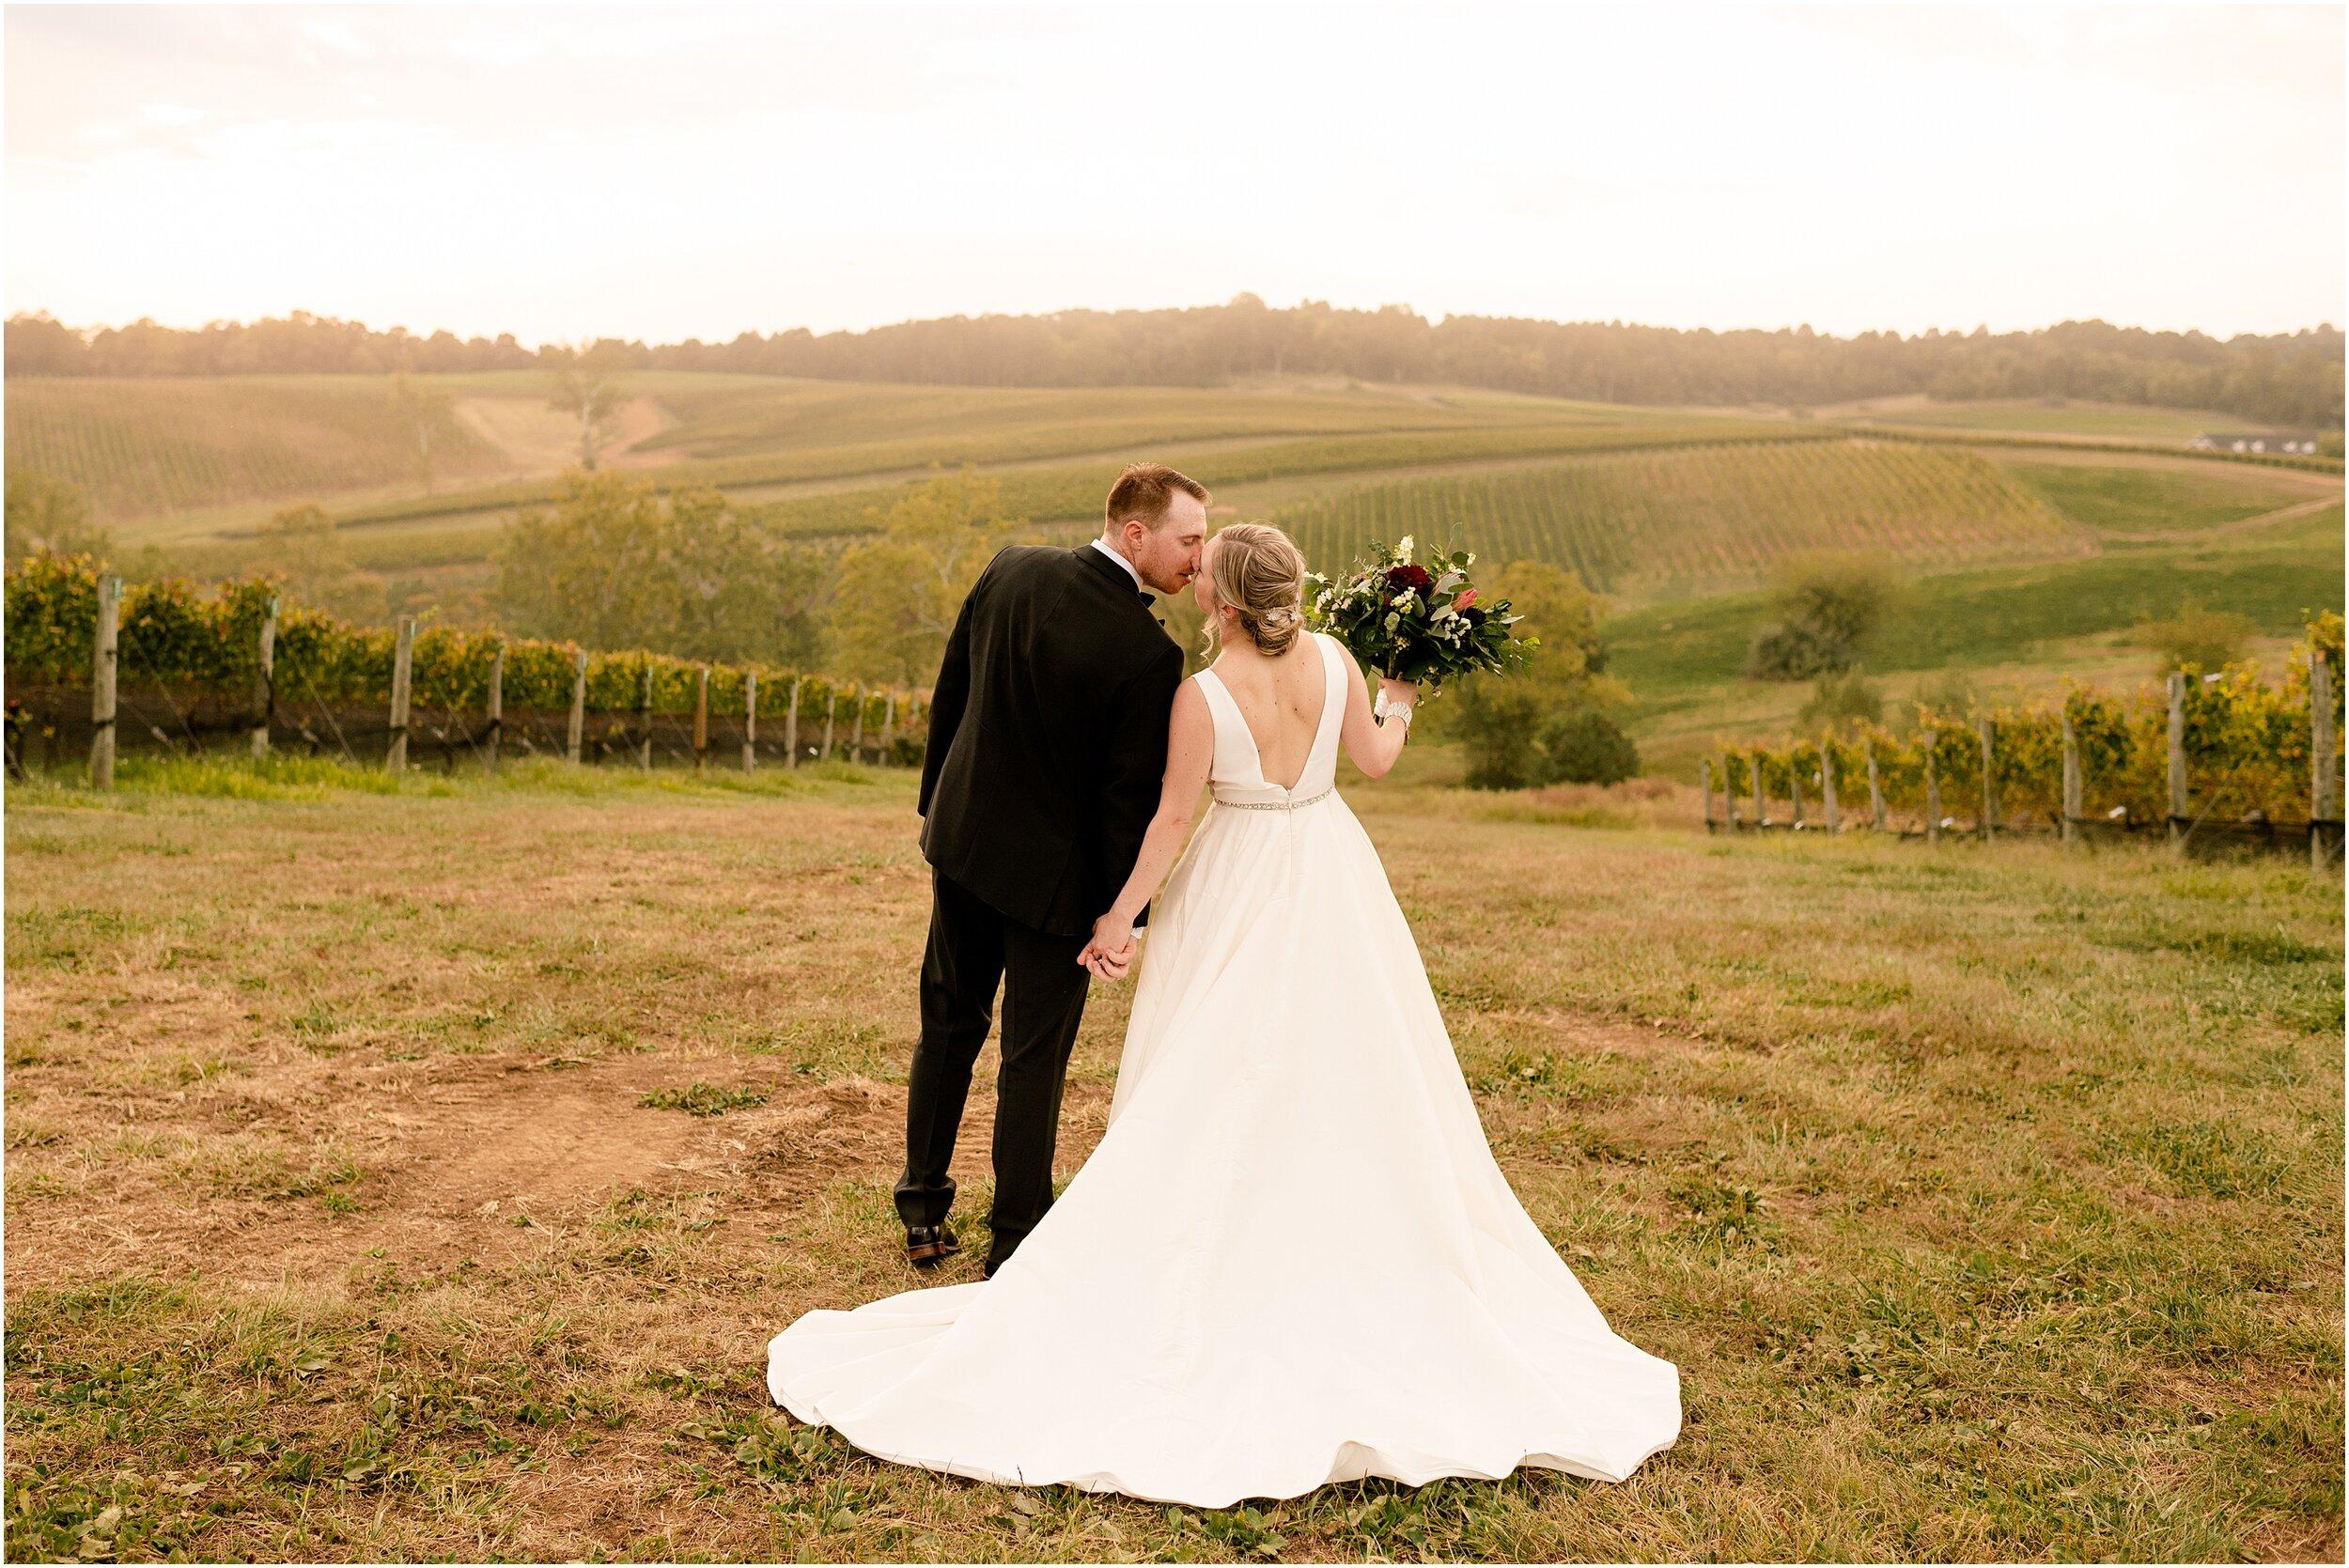 hannah leigh photography stone tower winery wedding leesburg va_3926.jpg